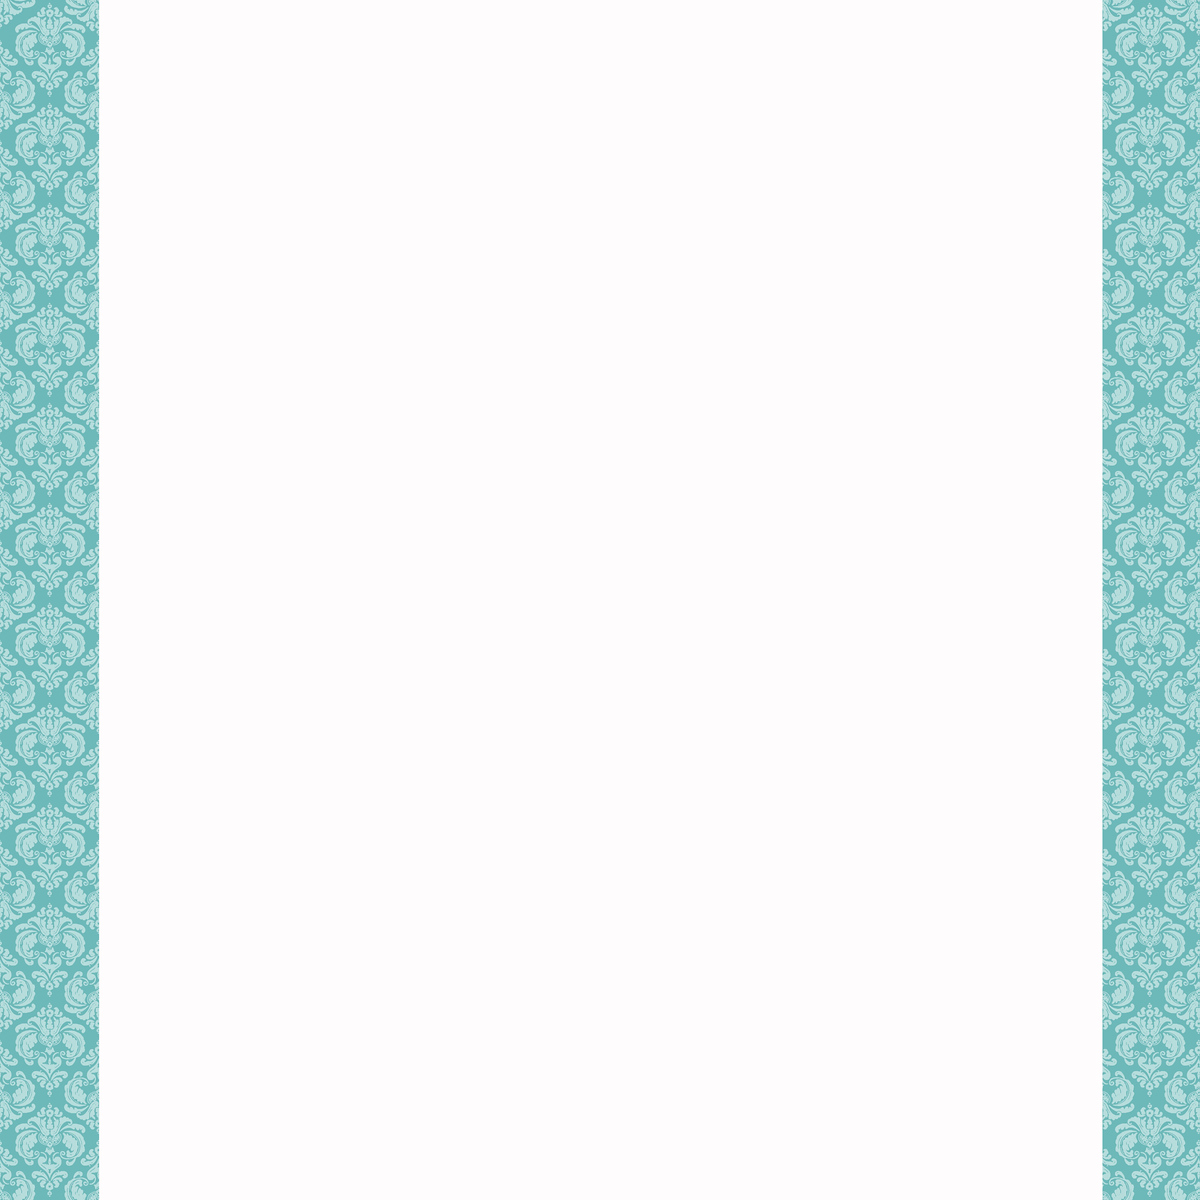 blue-tonal-website-background4